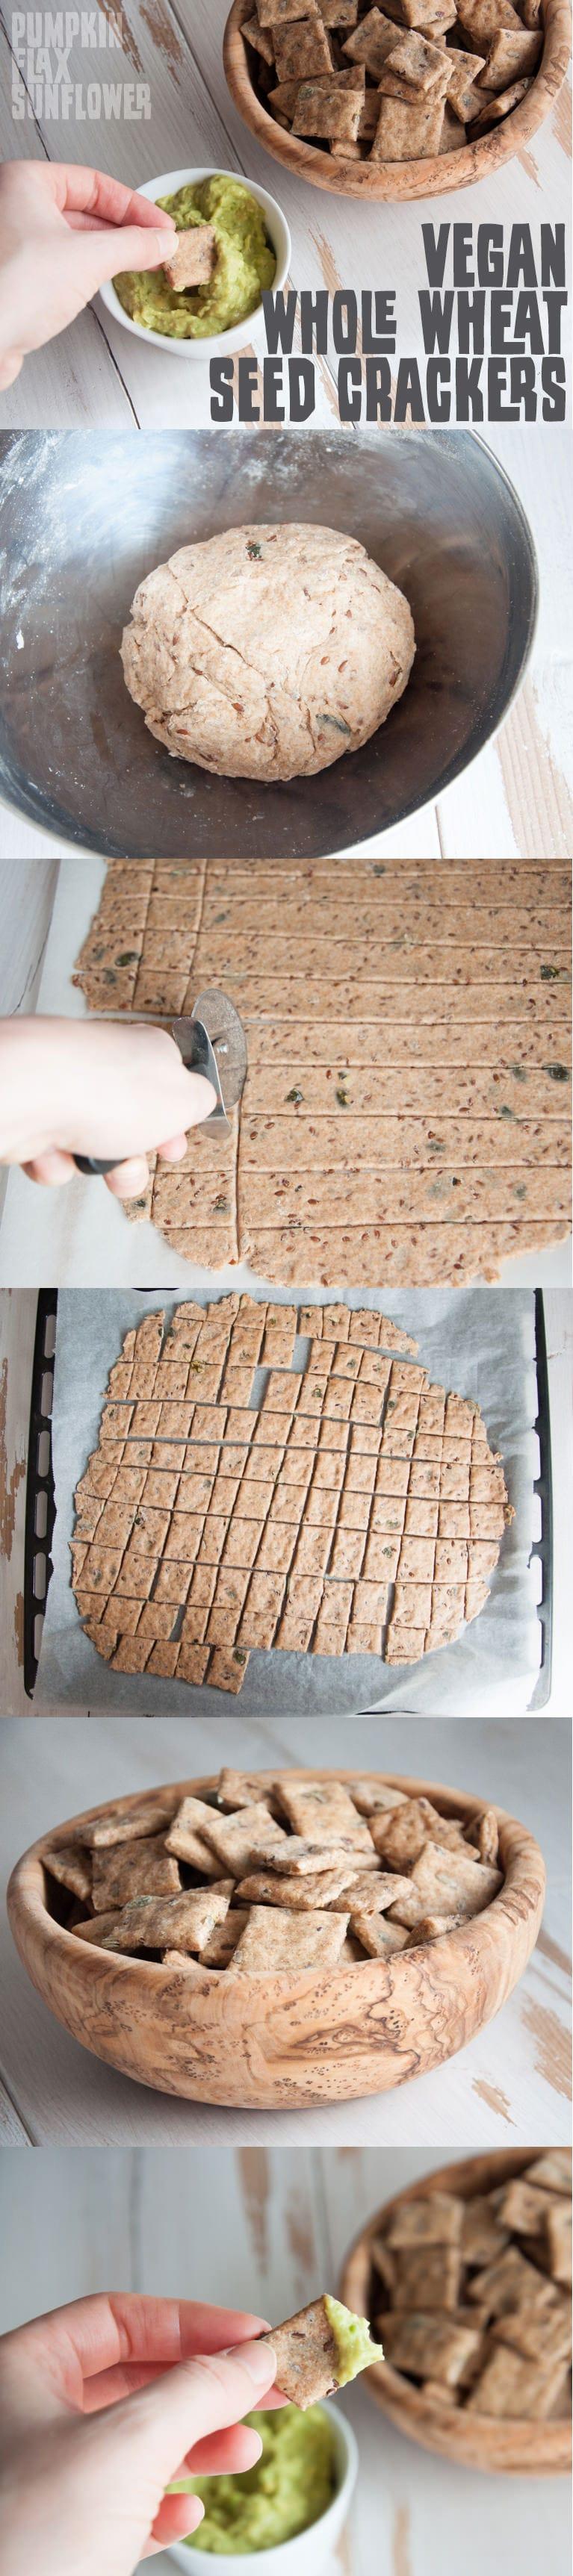 Vegan Whole Wheat Seed Crackers